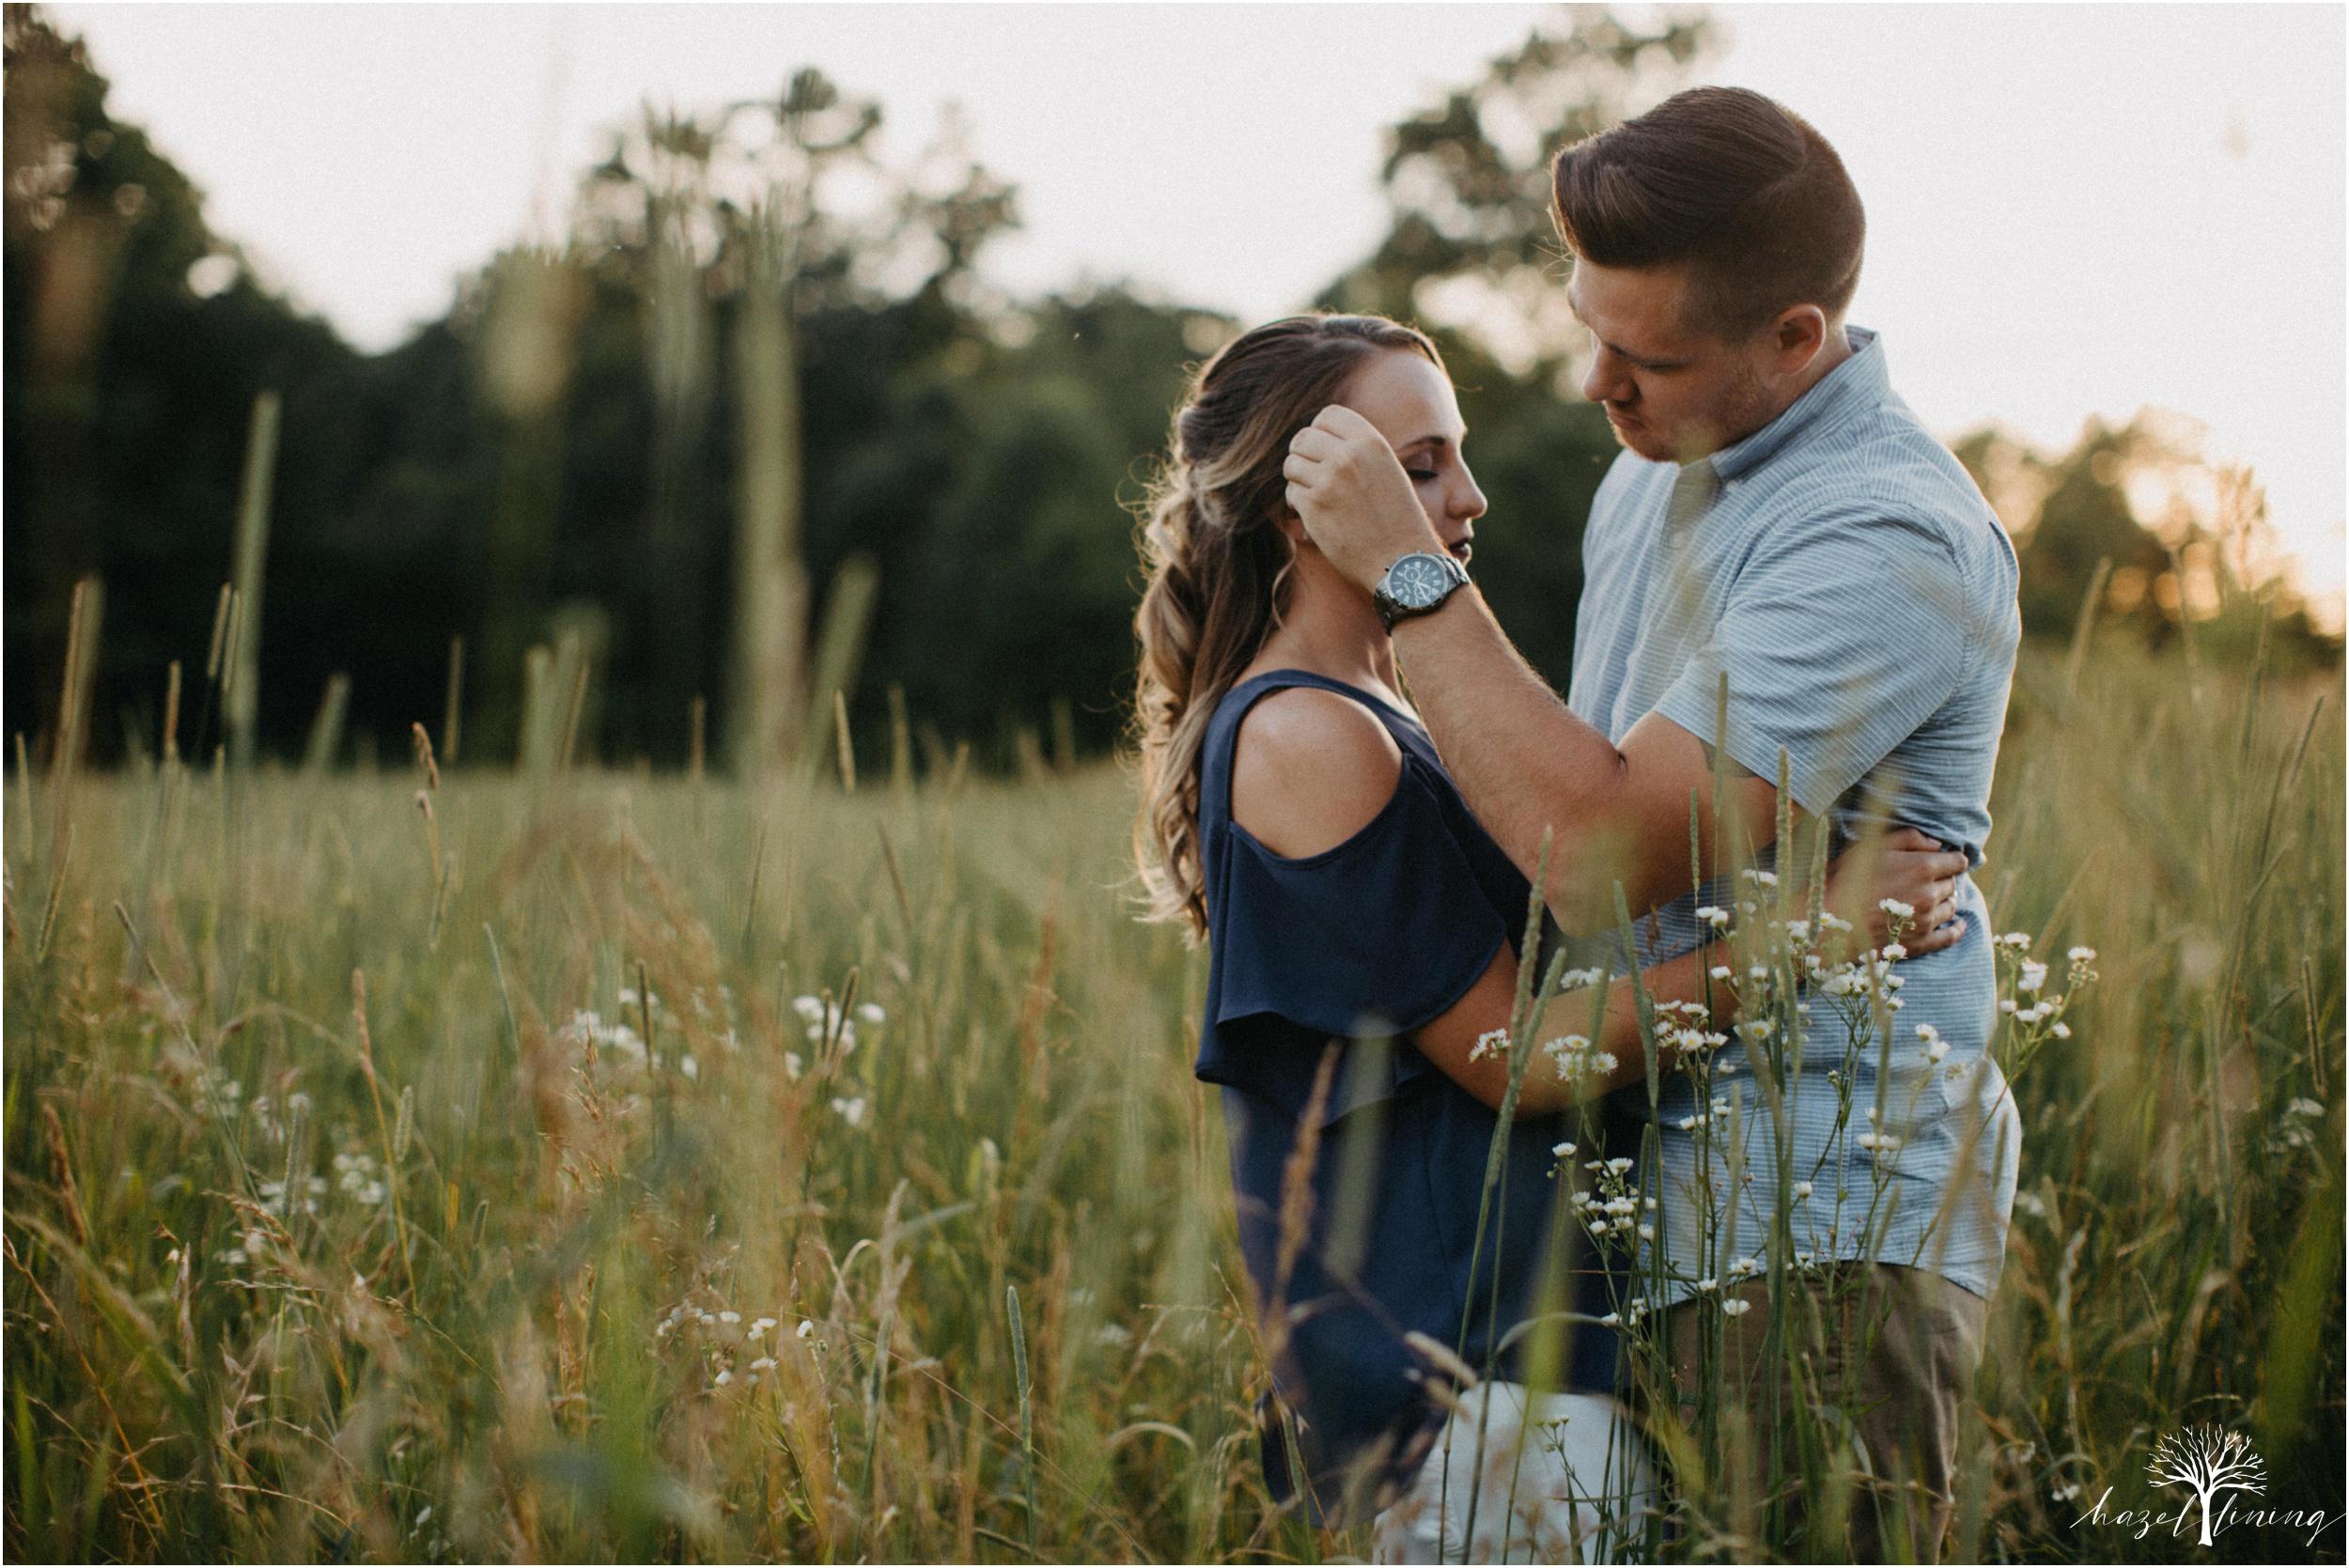 rachel-warner-chris-niedrist-the-farm-bakery-and-events-quakertown-pa-summer-engagement-hazel-lining-photography-destination-elopement-wedding-engagement-photography_0044.jpg